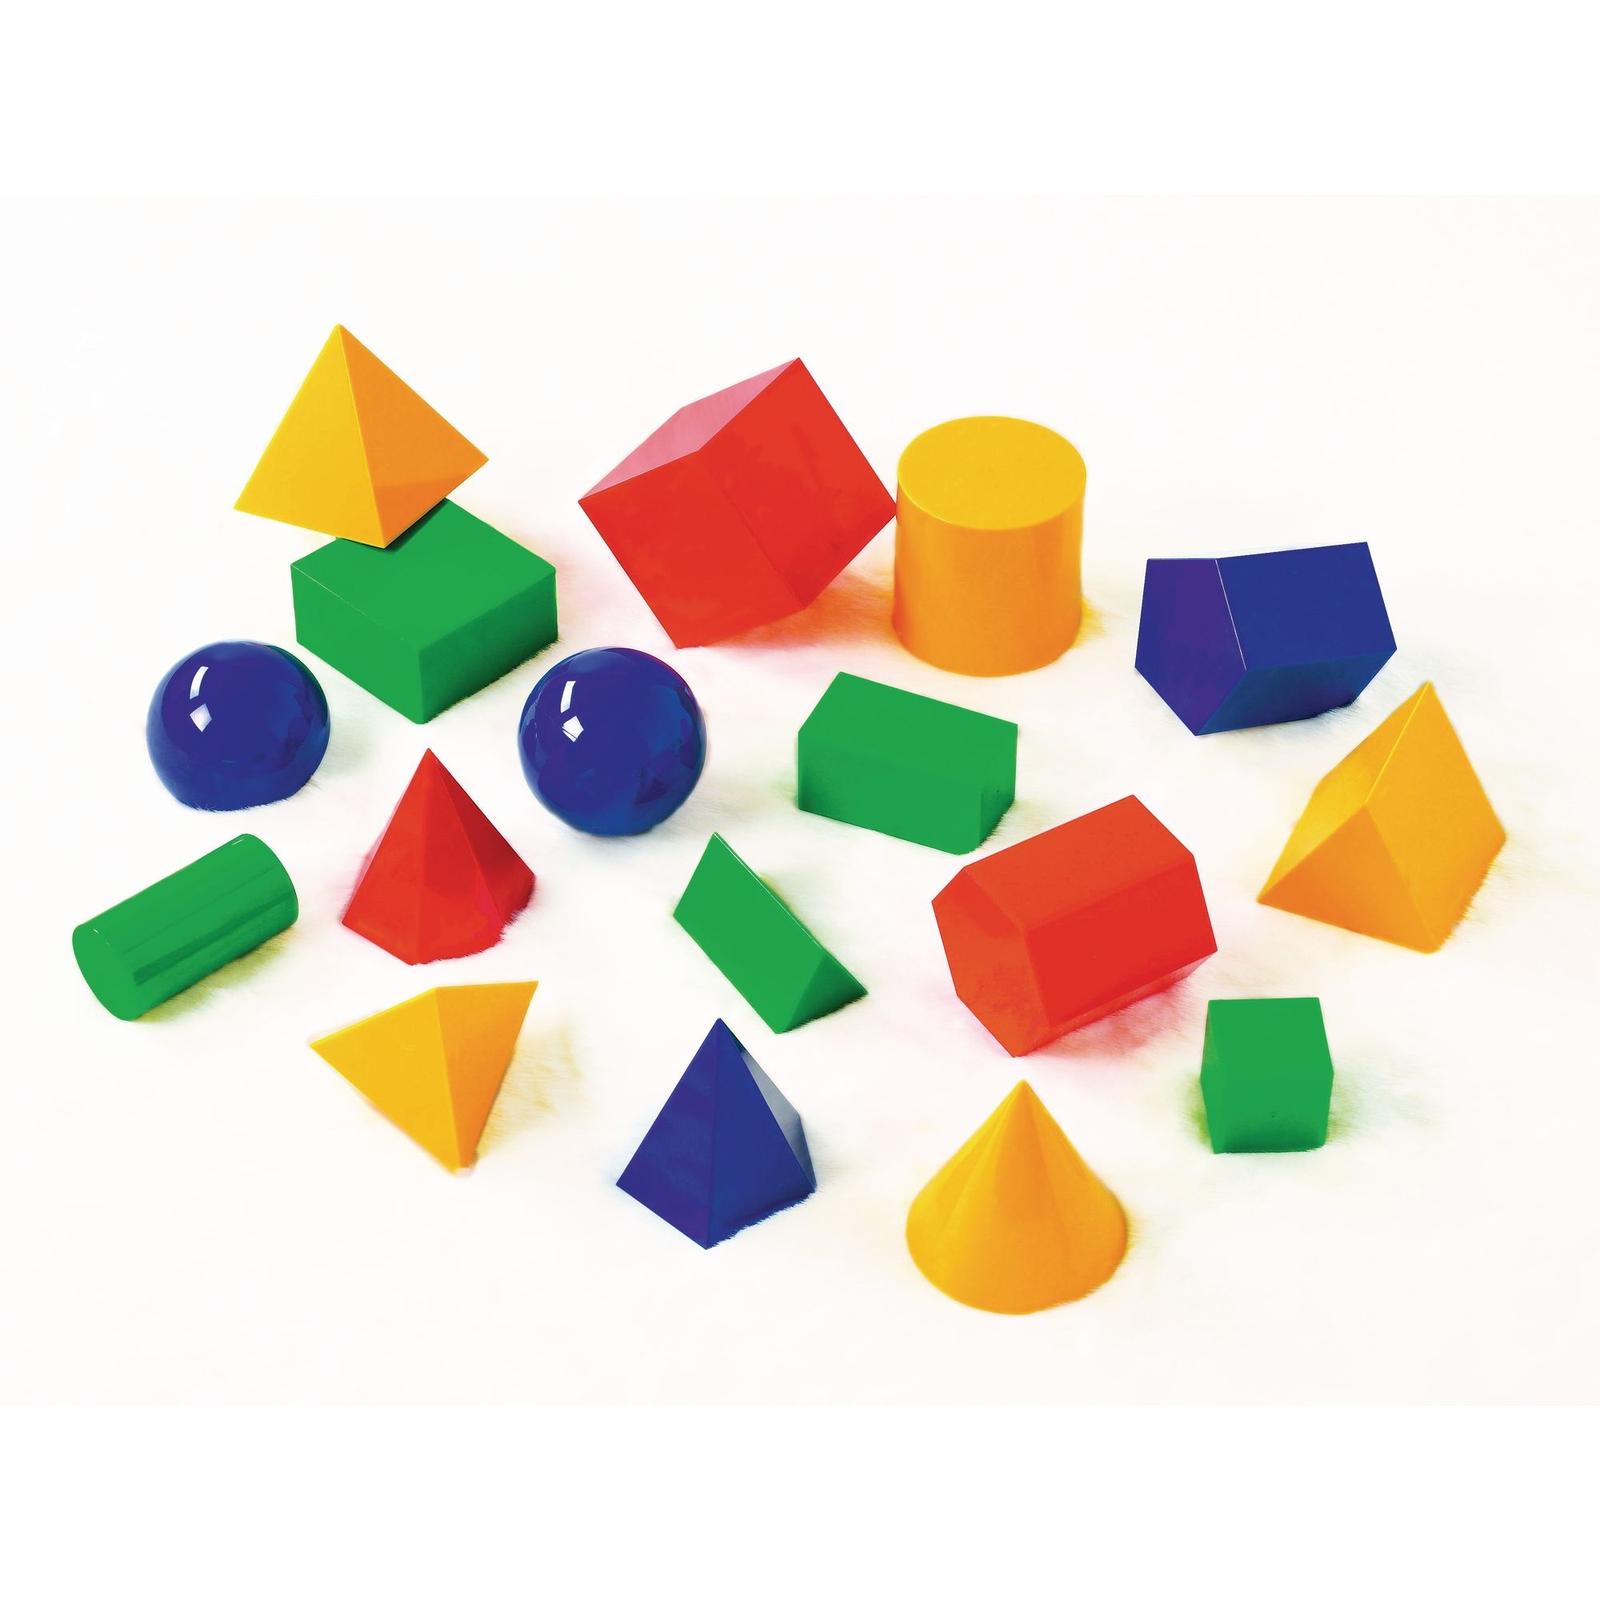 Geometry & Shapes